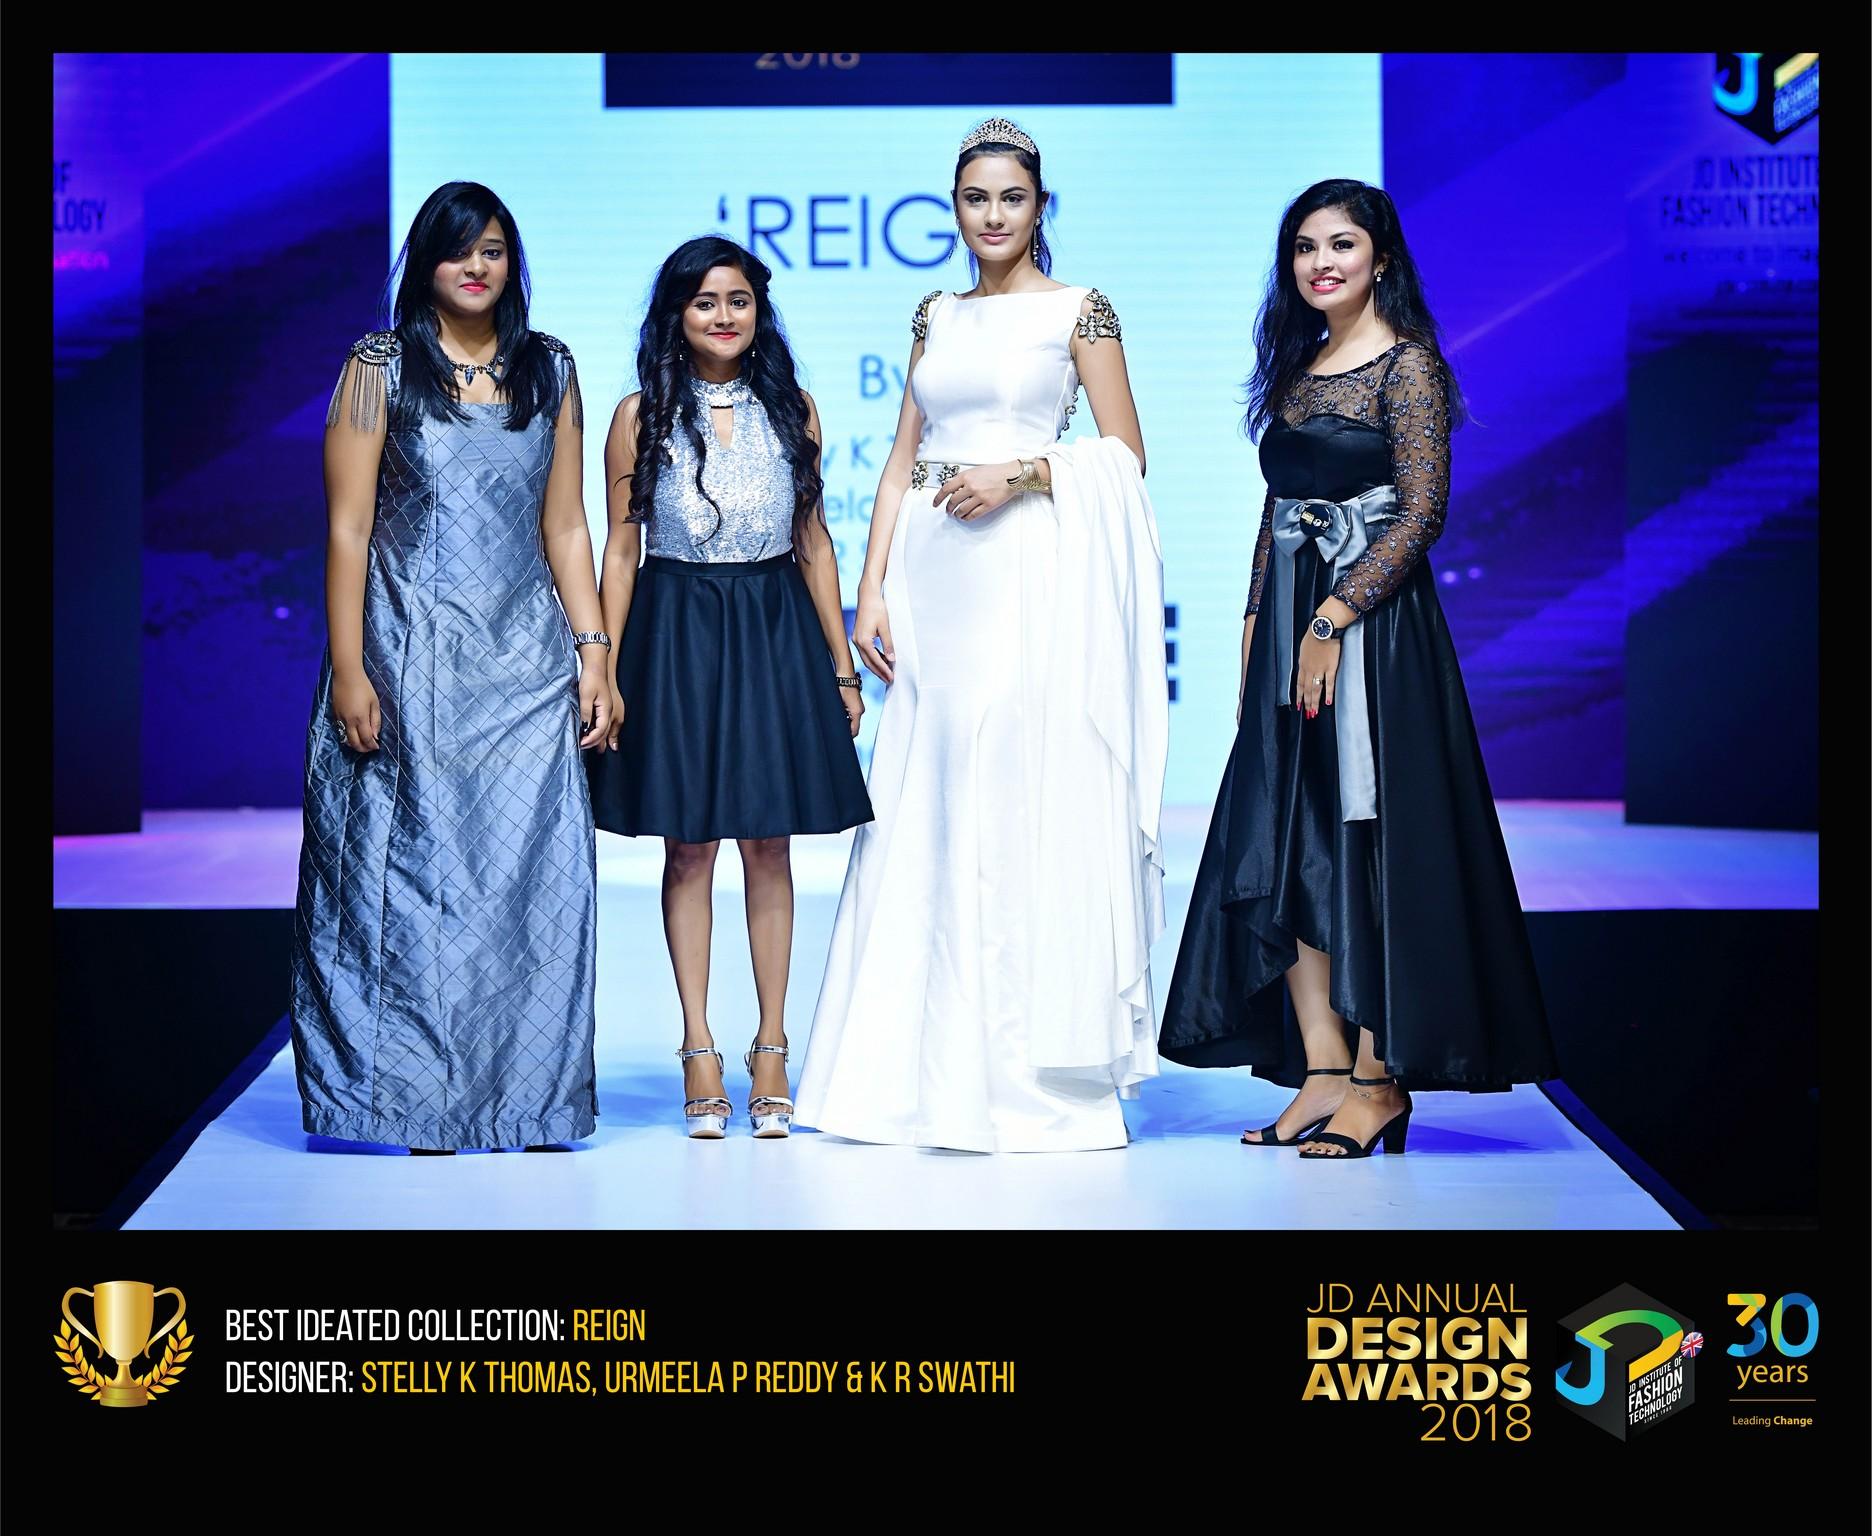 Reign – Change – JD Annual Design Awards 2018 | Designer: Swathi, Stelly and Urmeela | Photography : Jerin Nath (@jerin_nath) reign - 18 06 2018 REIGN Photos JDW FB8 - Reign – Change – JD Annual Design Awards 2018